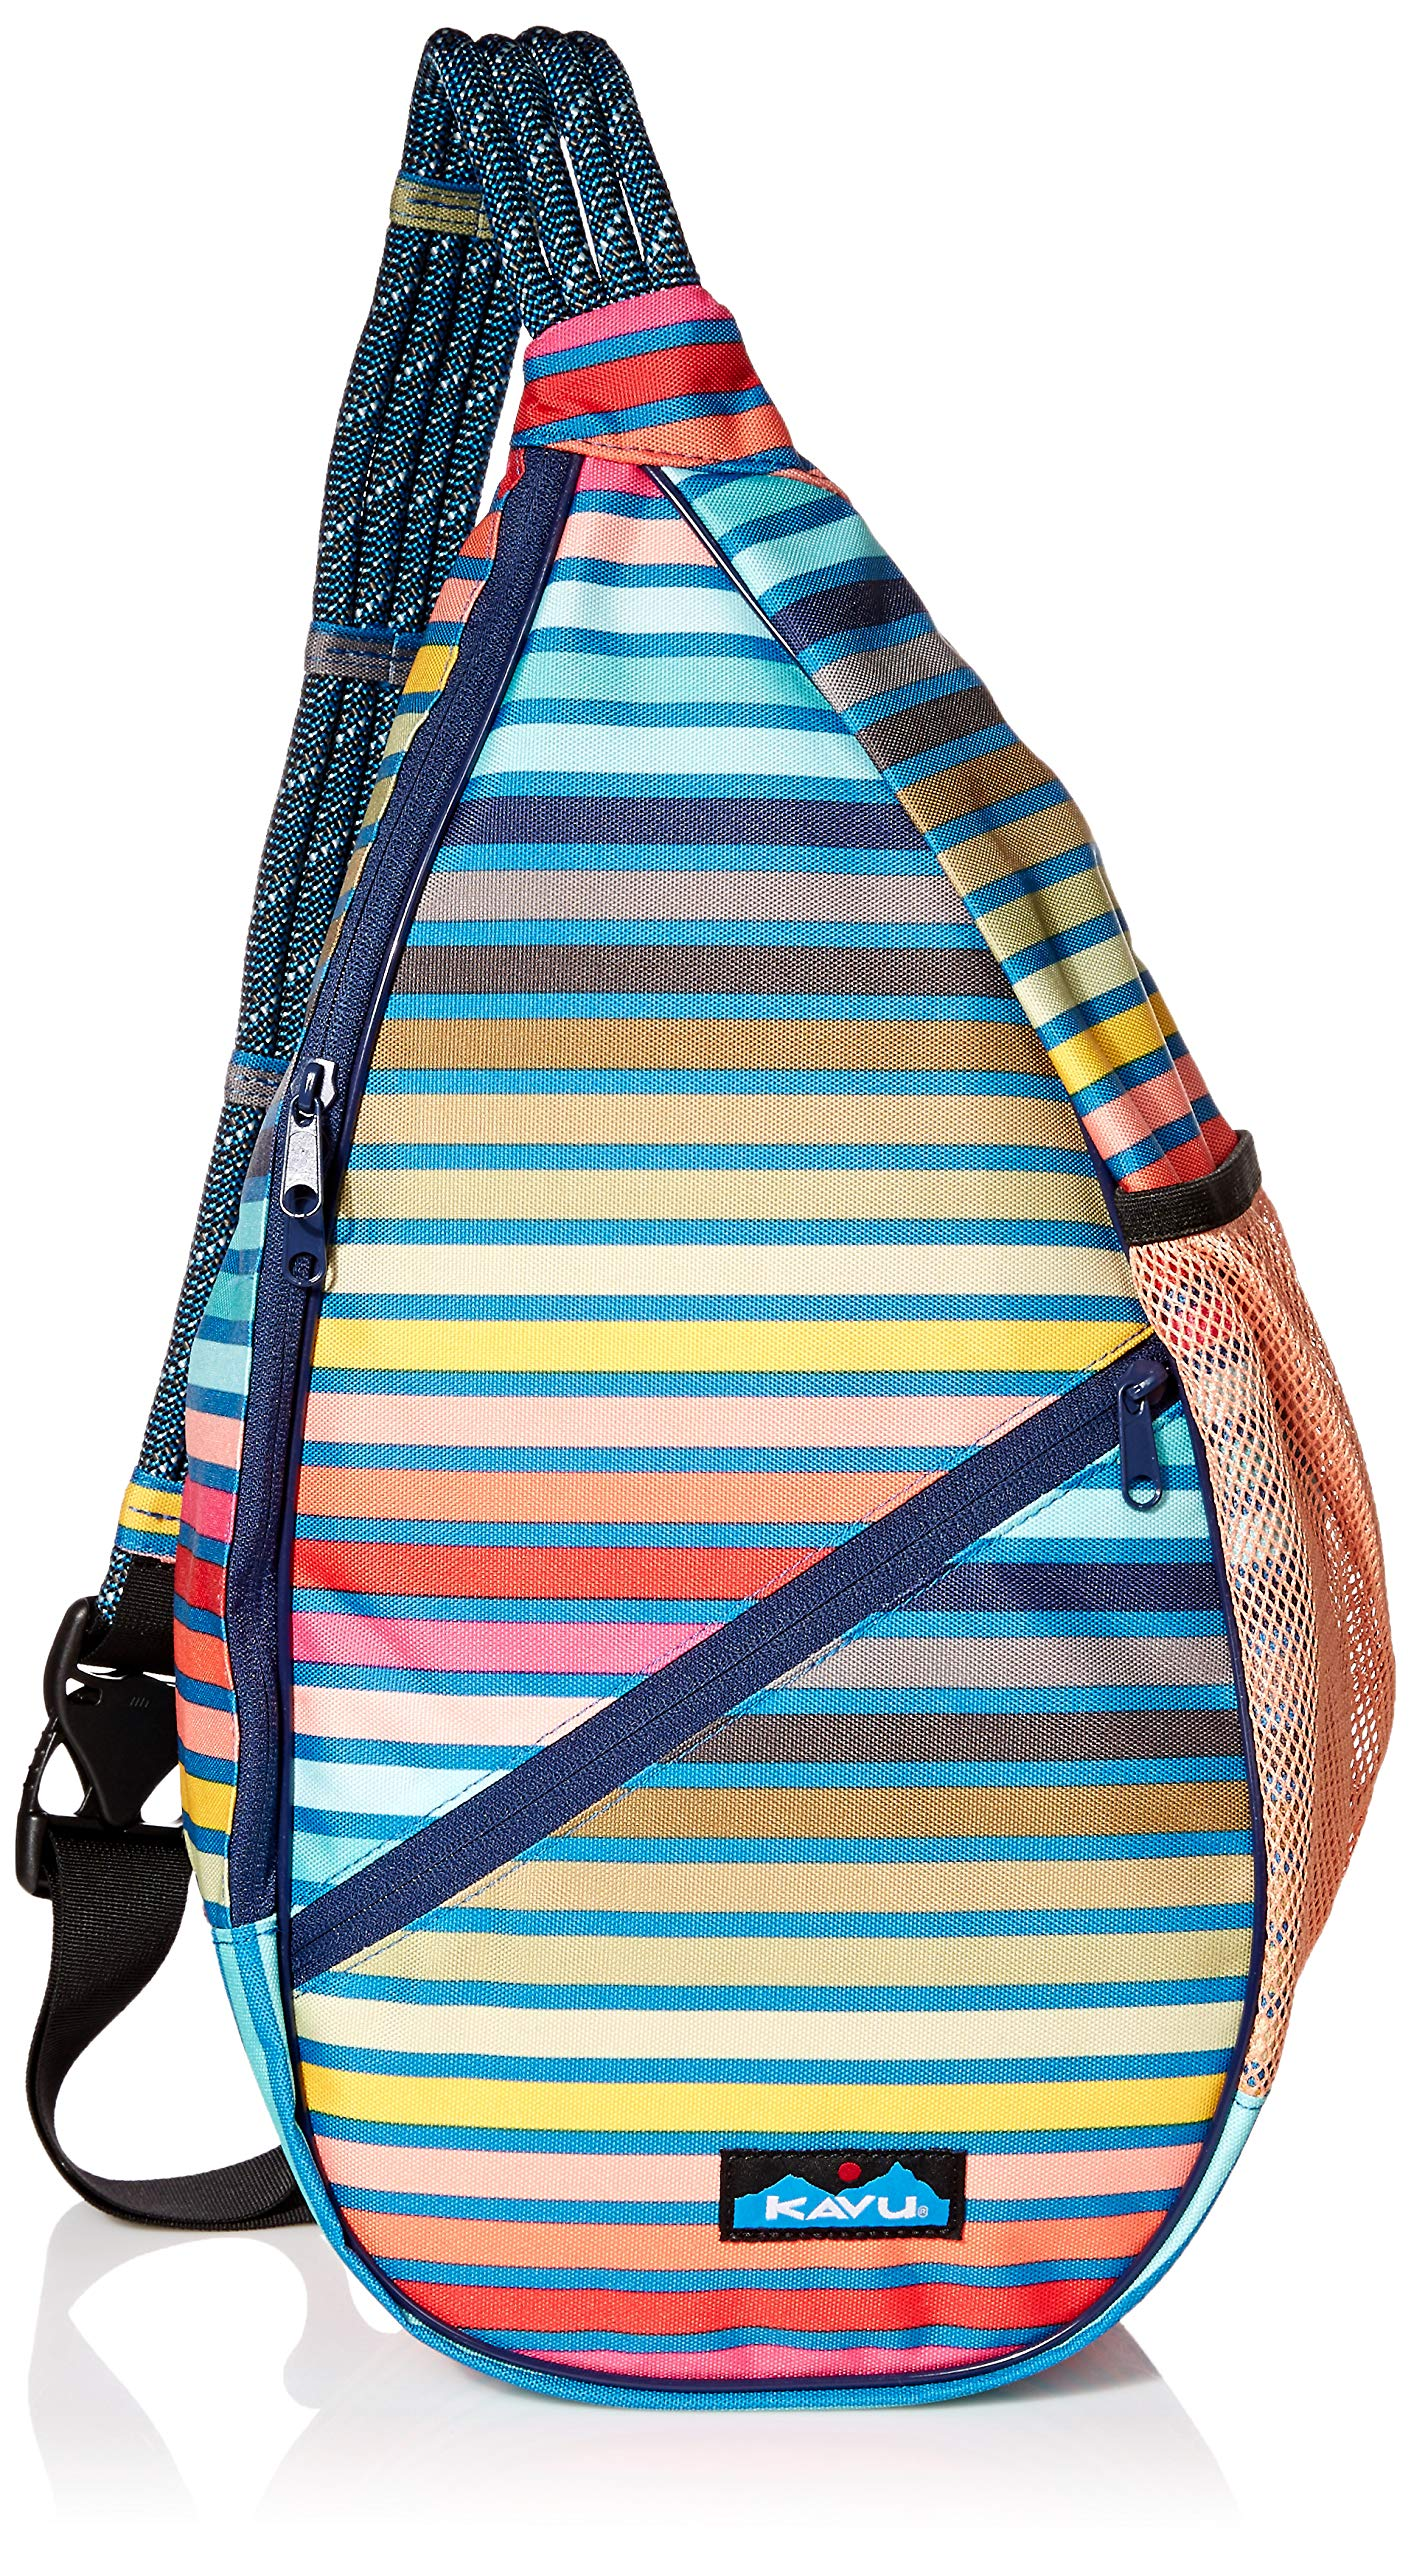 KAVU Women's Paxton Pack, Chroma Stripe, No Size